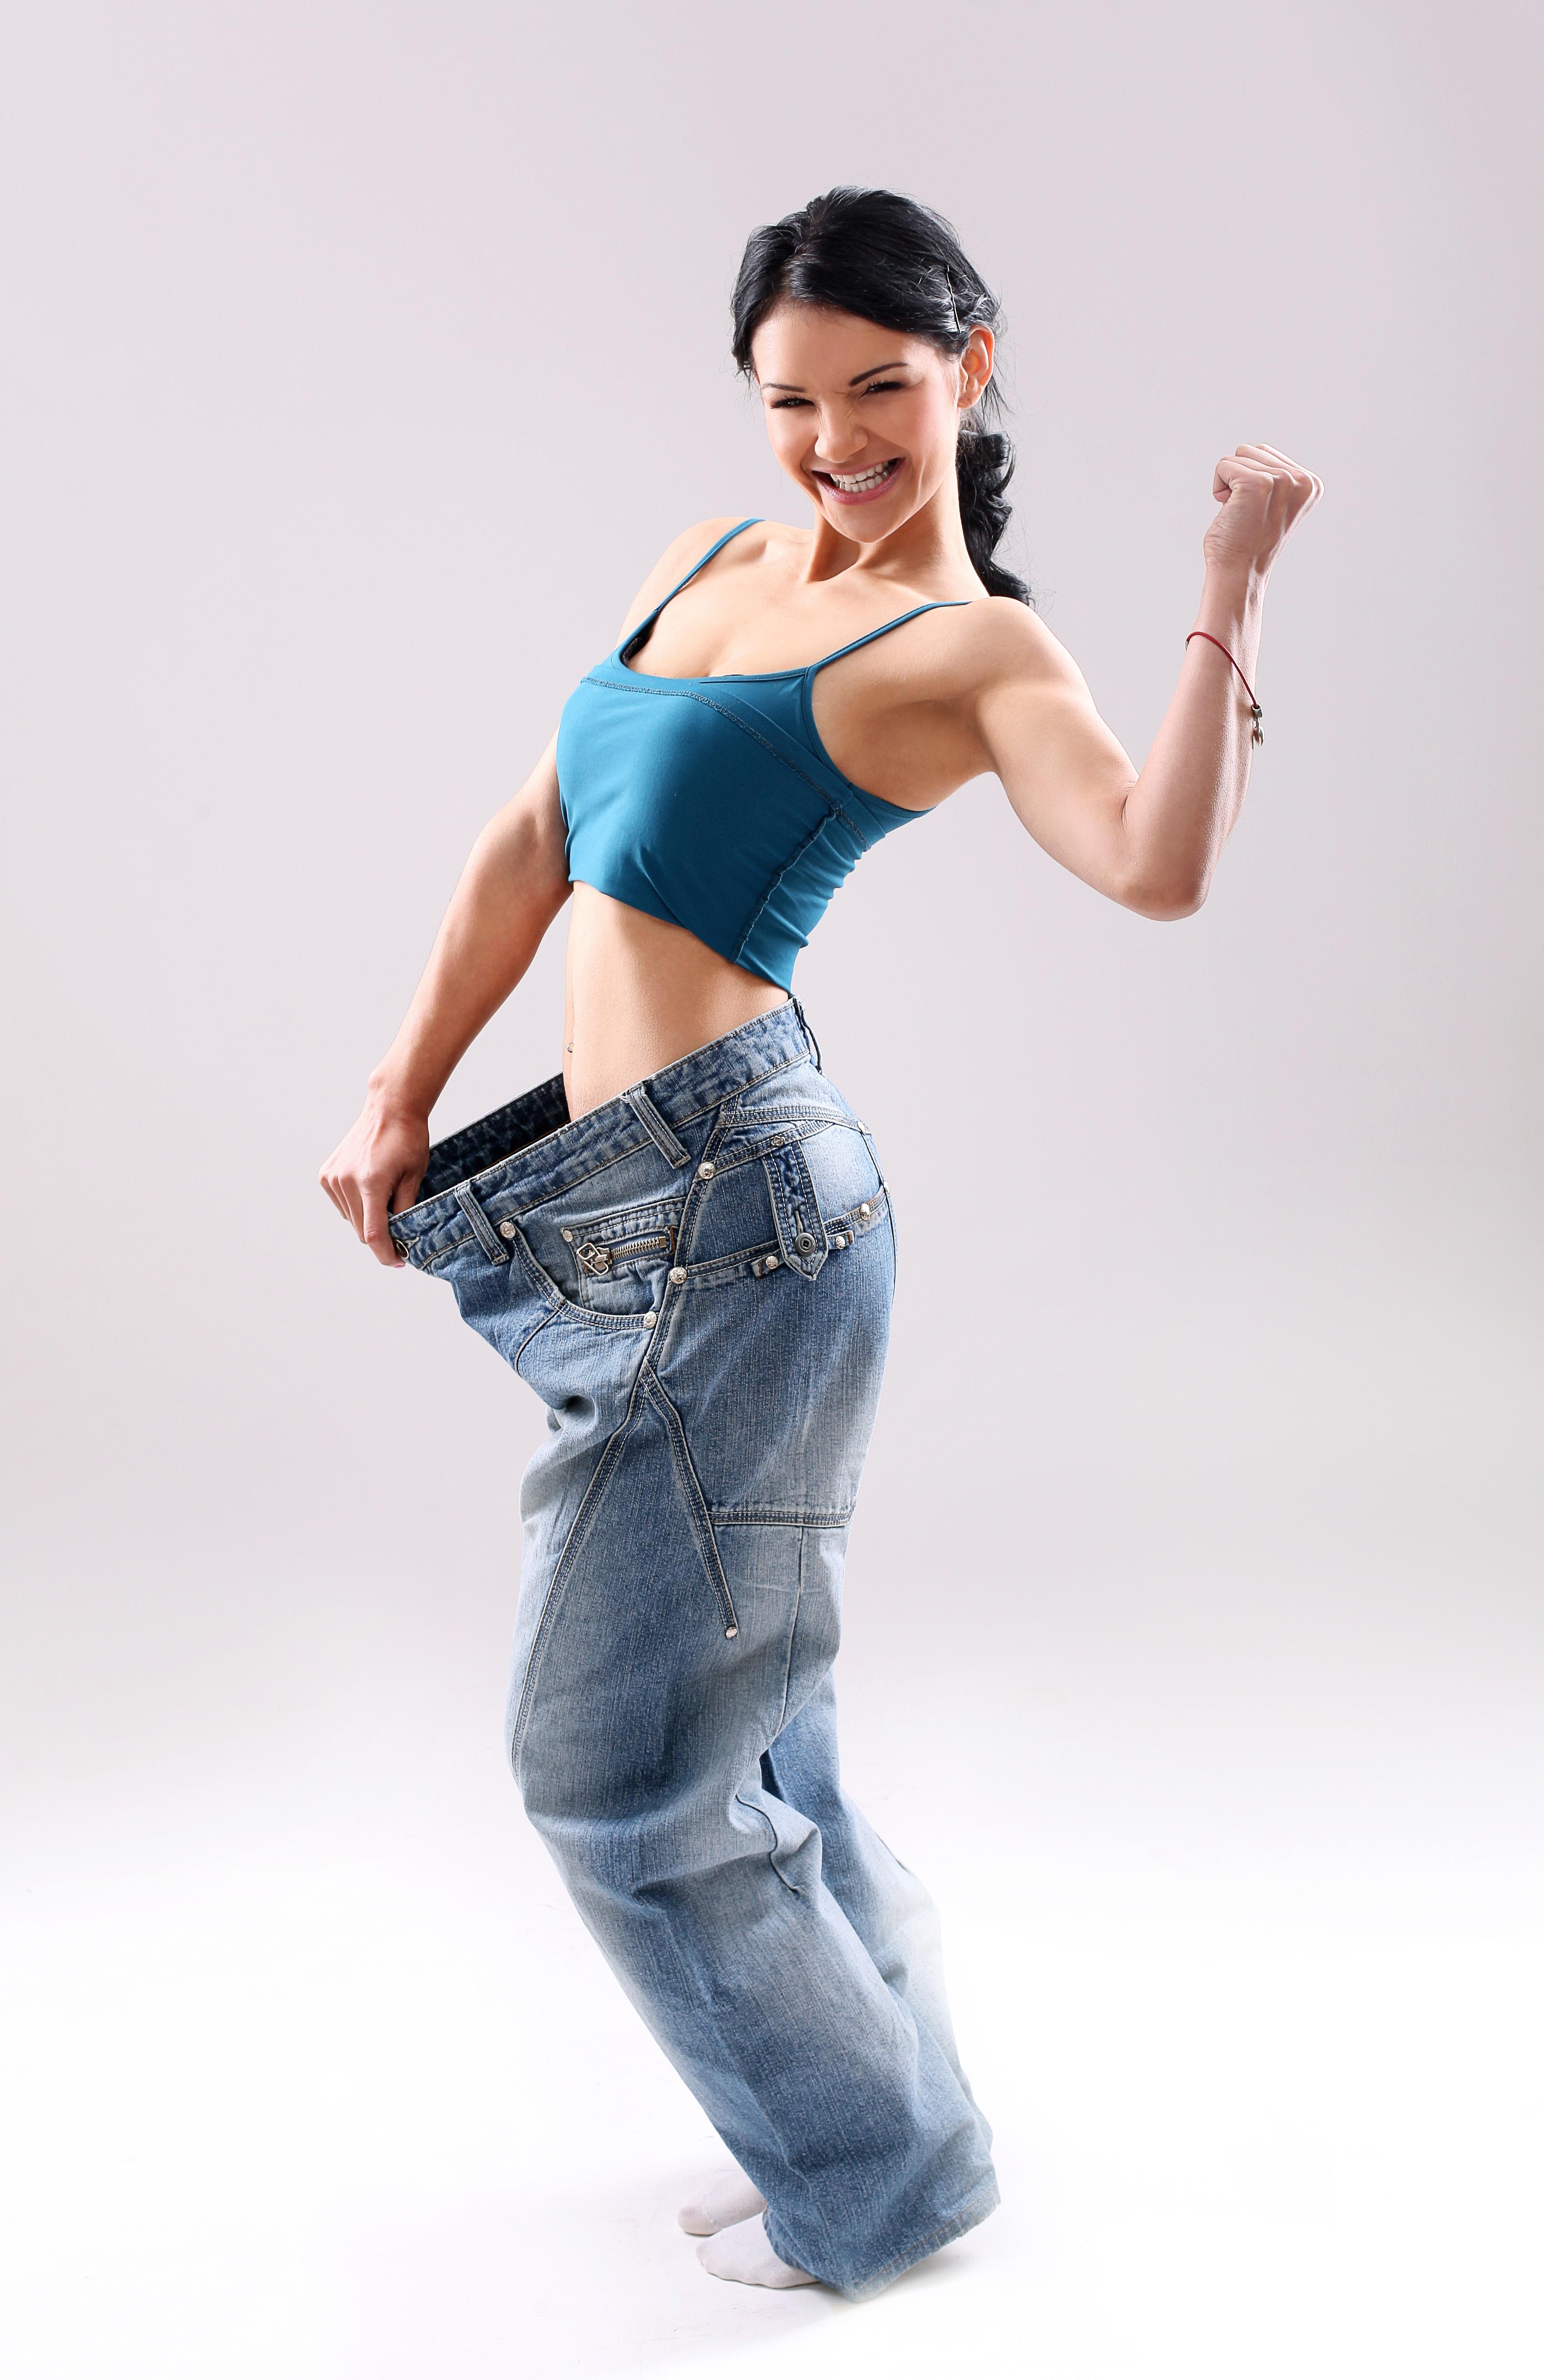 Curso fitness para adelgazar - ORTHOS - Claudio Caamaño